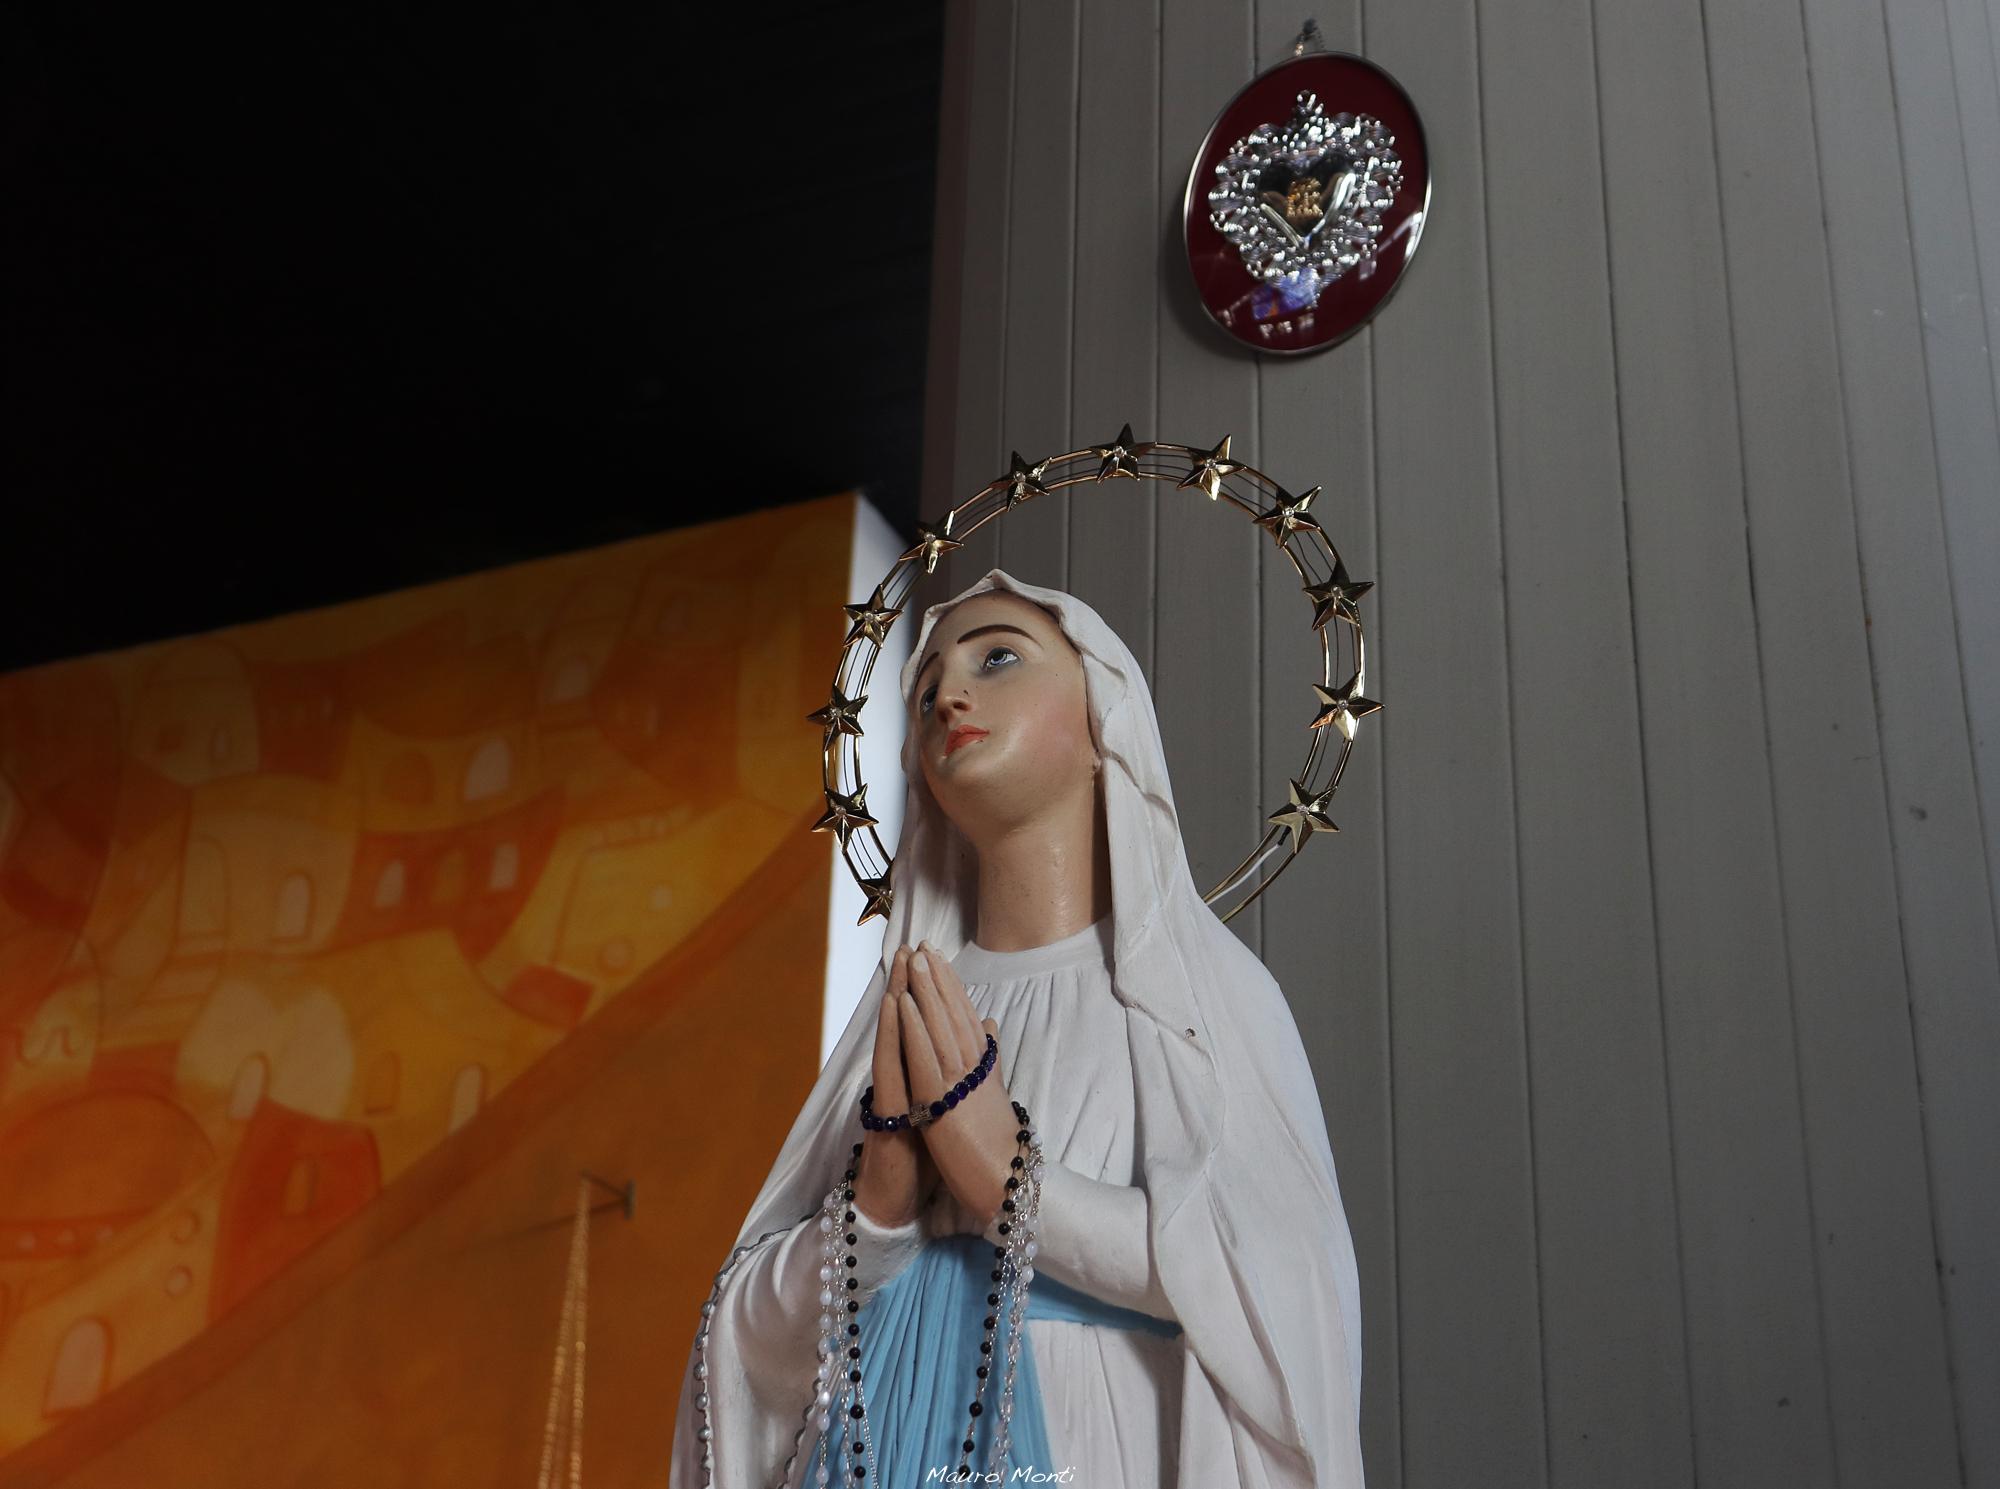 Beata Vergine Maria, Corviale - Photo Mauro Monti